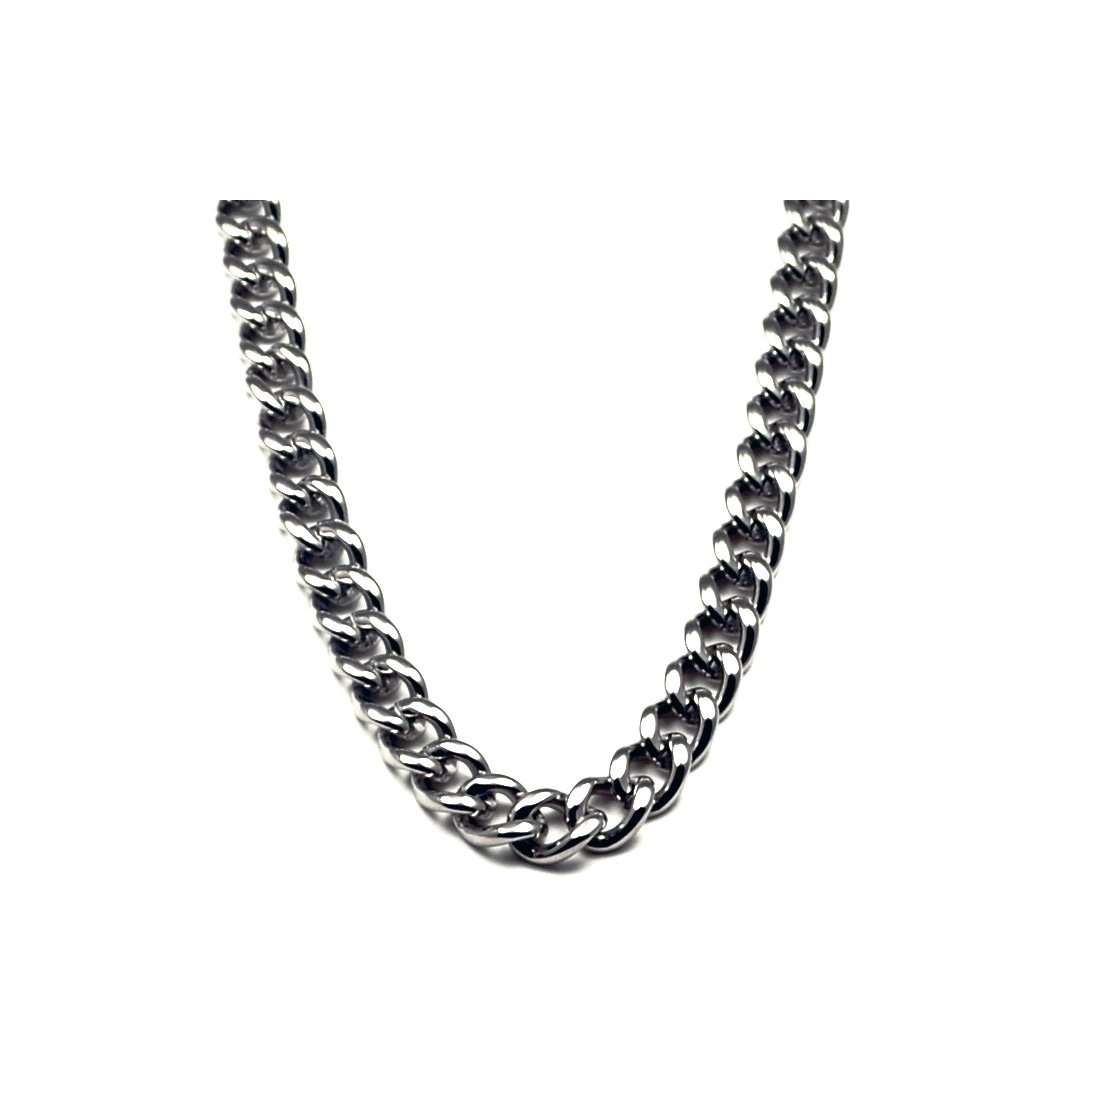 6.9mm Titanium Men's Curb Link Necklace Chain by Accents Kingdom (Image #1)